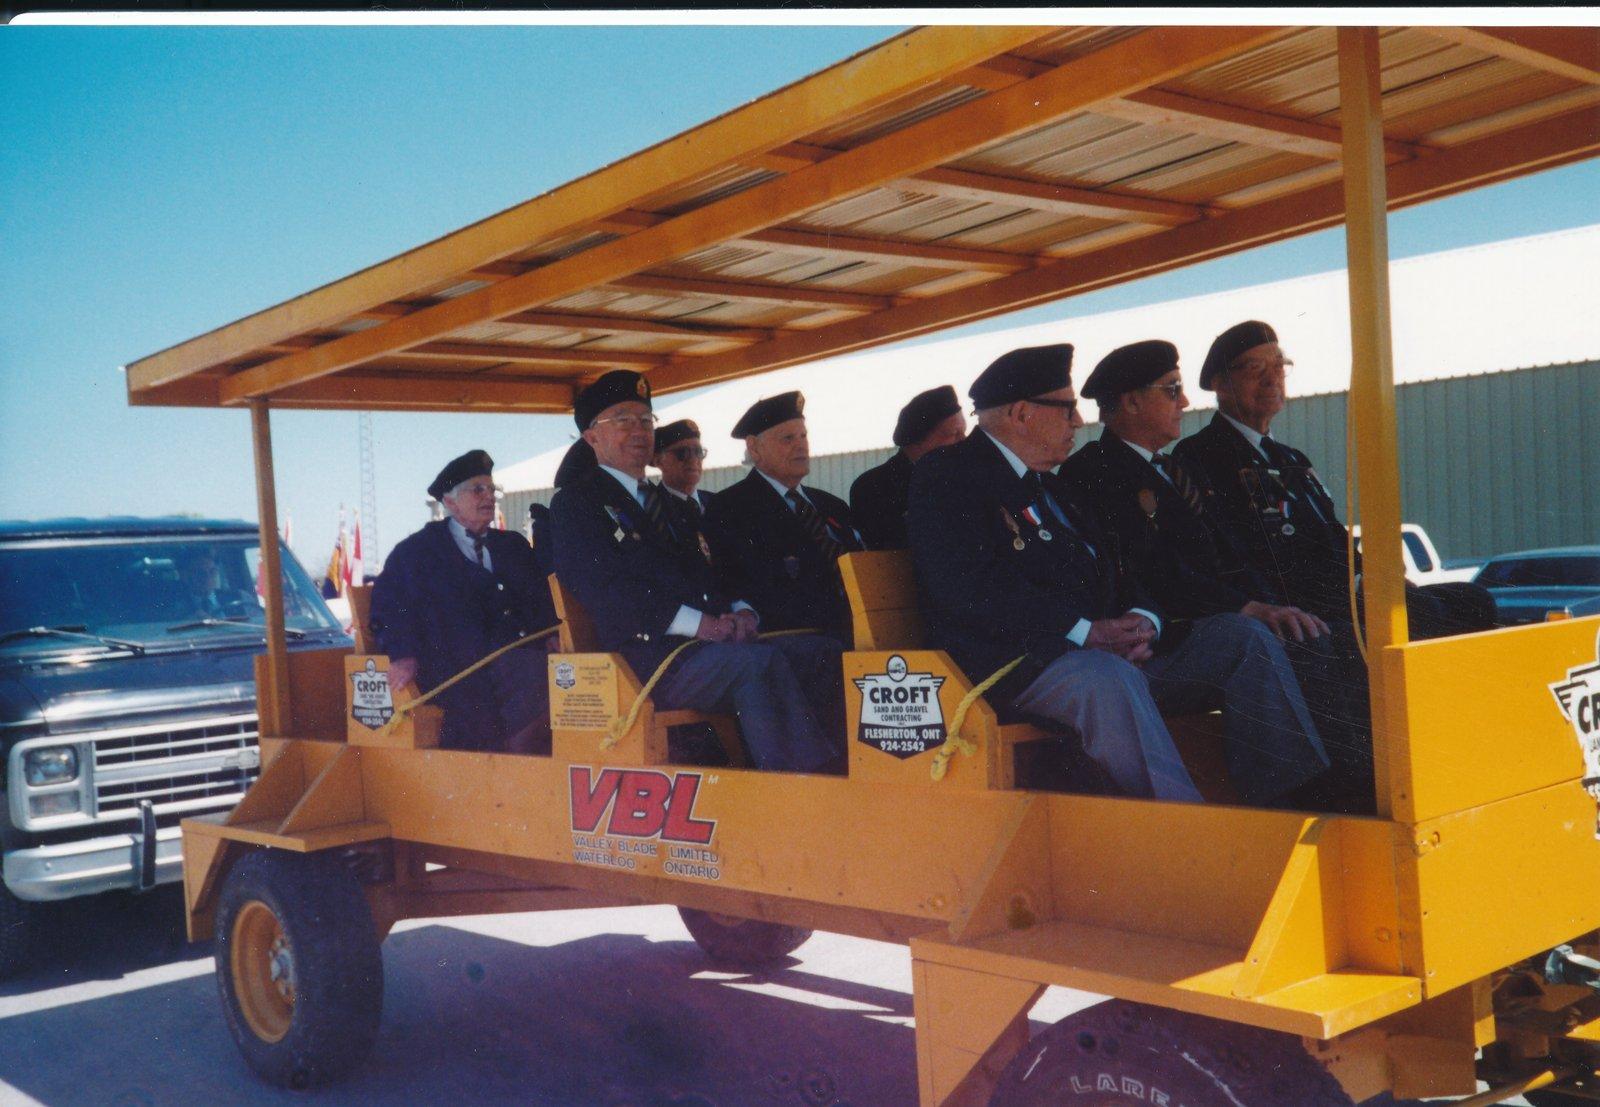 Priceville Veterans ride in Croft's wagon